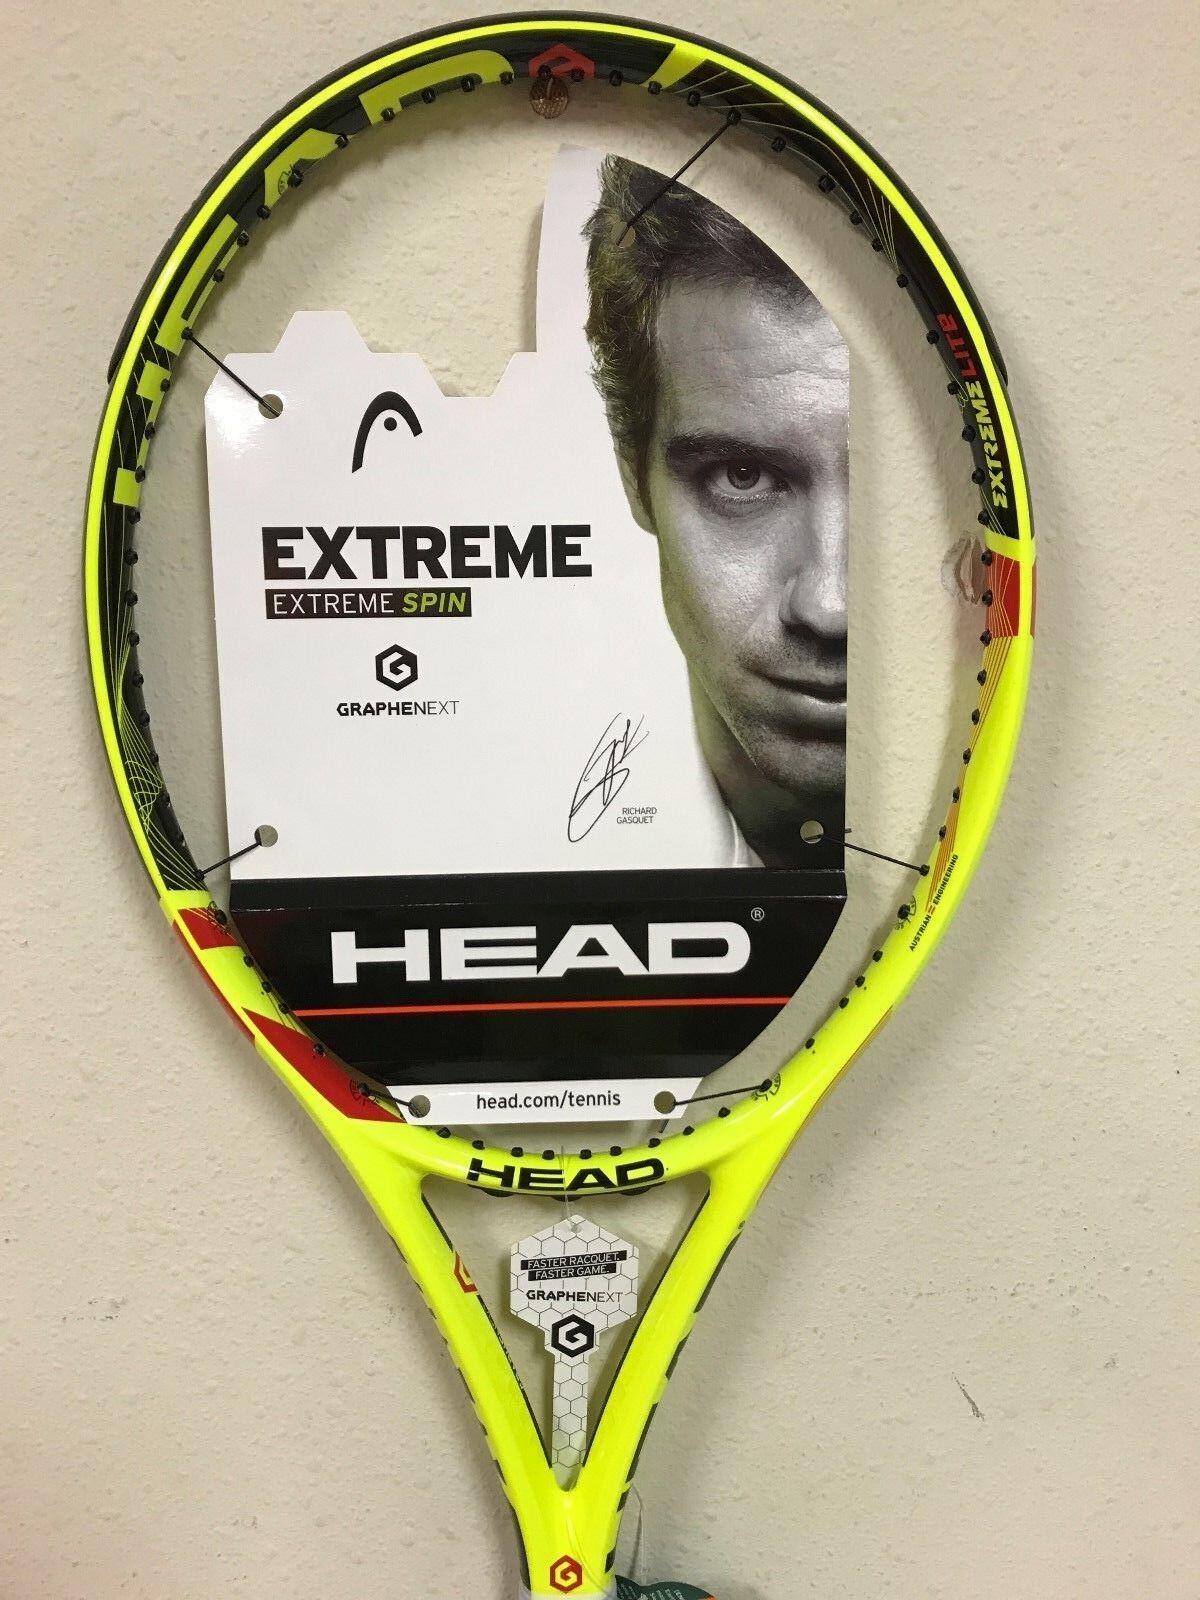 Head Graphene Xt Extreme Lite Tenis Raqueta Agarre  8